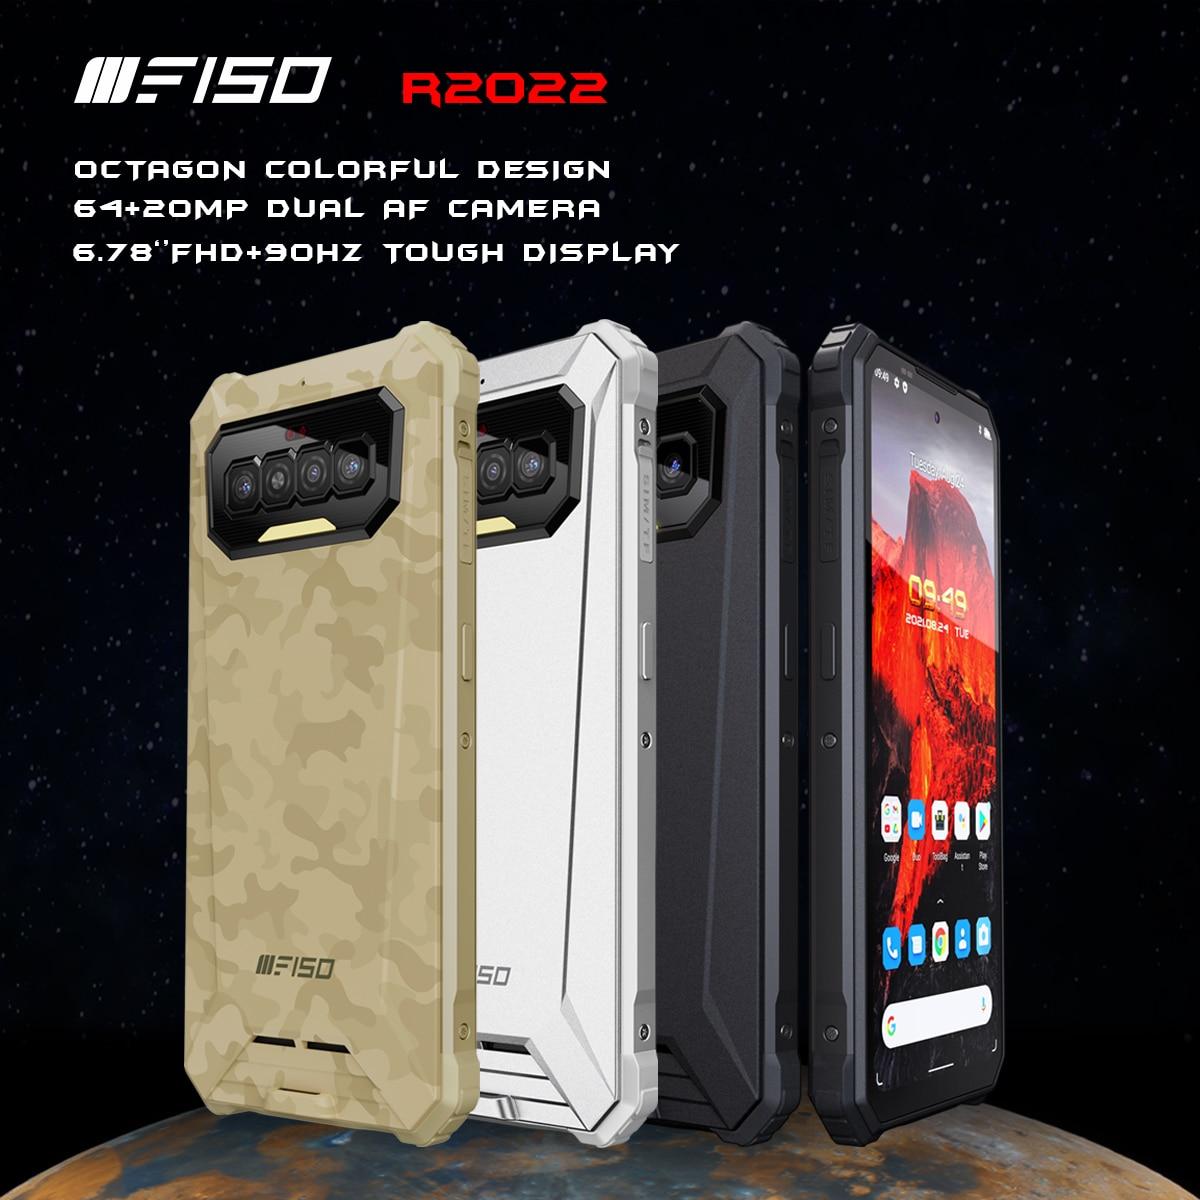 iiiF150 R2022 64MP+20MP AF Night Vision 6.78'' FHD 90Hz Smartphone IP68/69K Waterproof G95 8GB+128GB 8300mAh NFC Rugged Phone